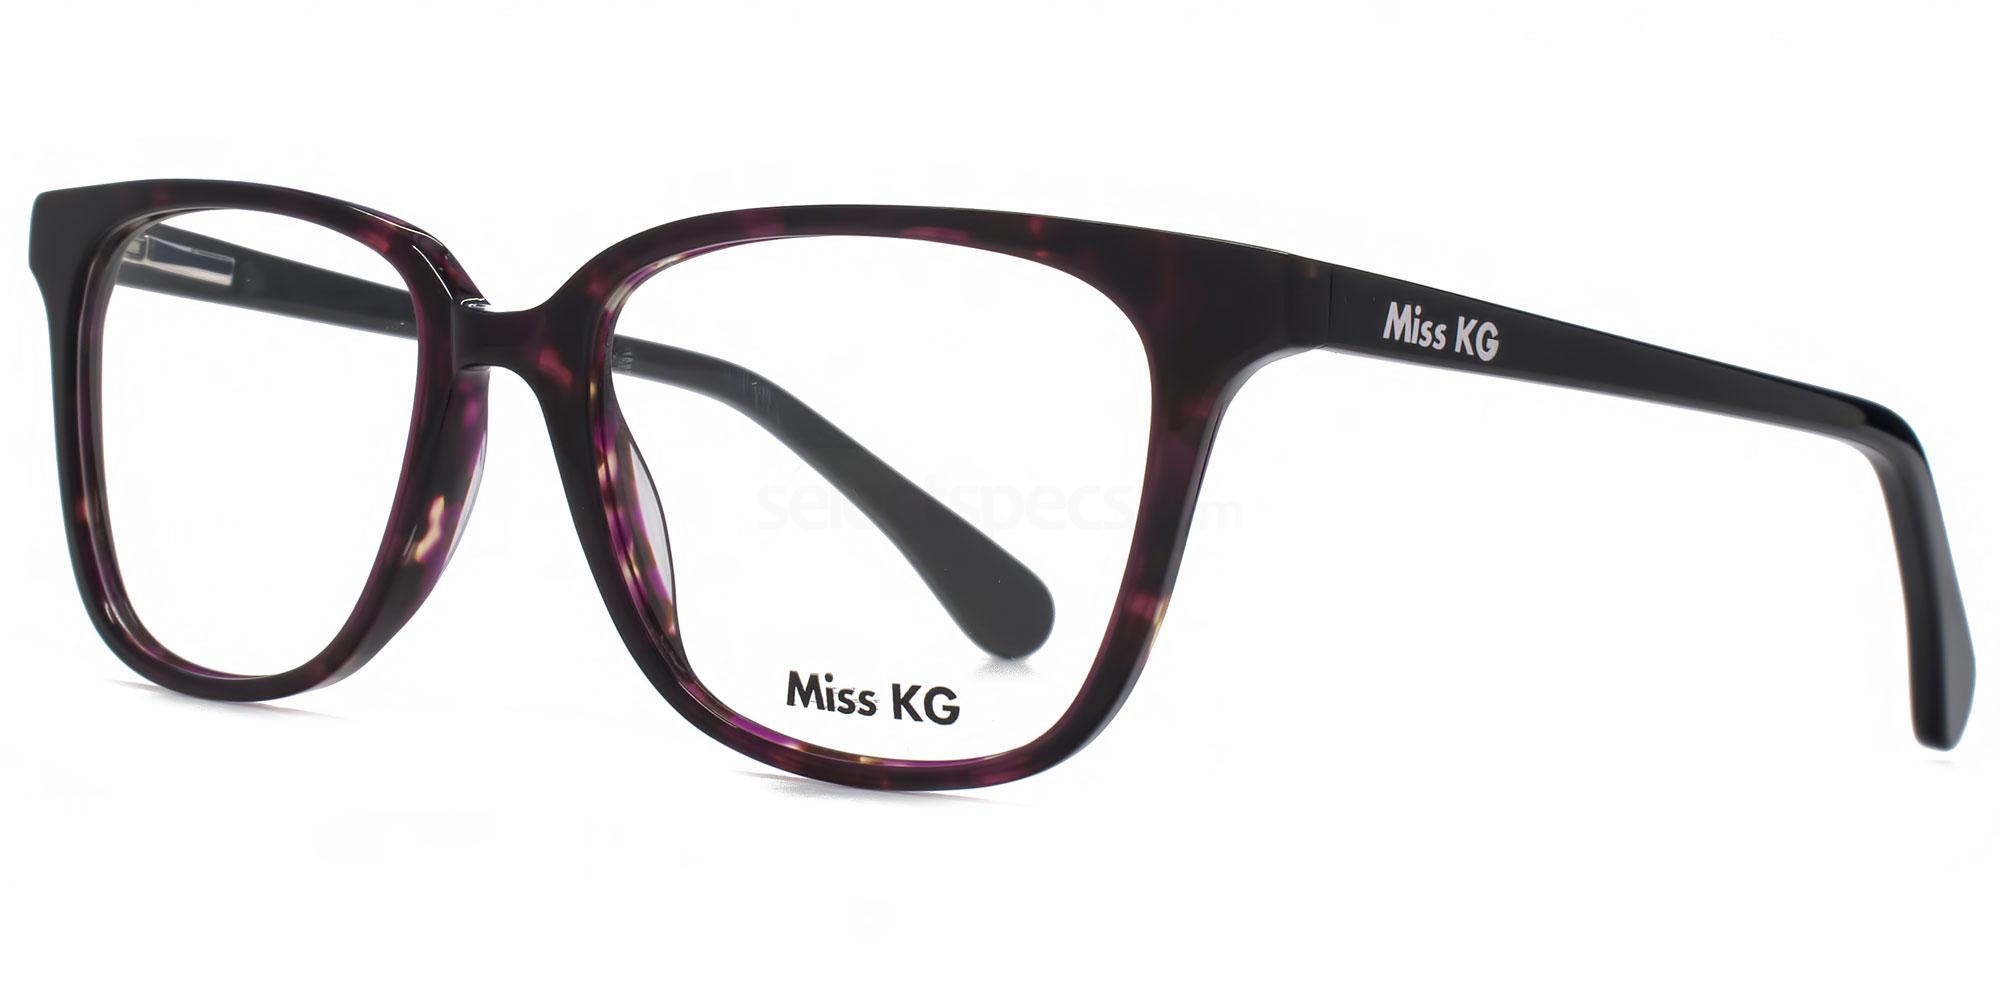 PTOR MKGS012 - Florrje Glasses, Miss KG